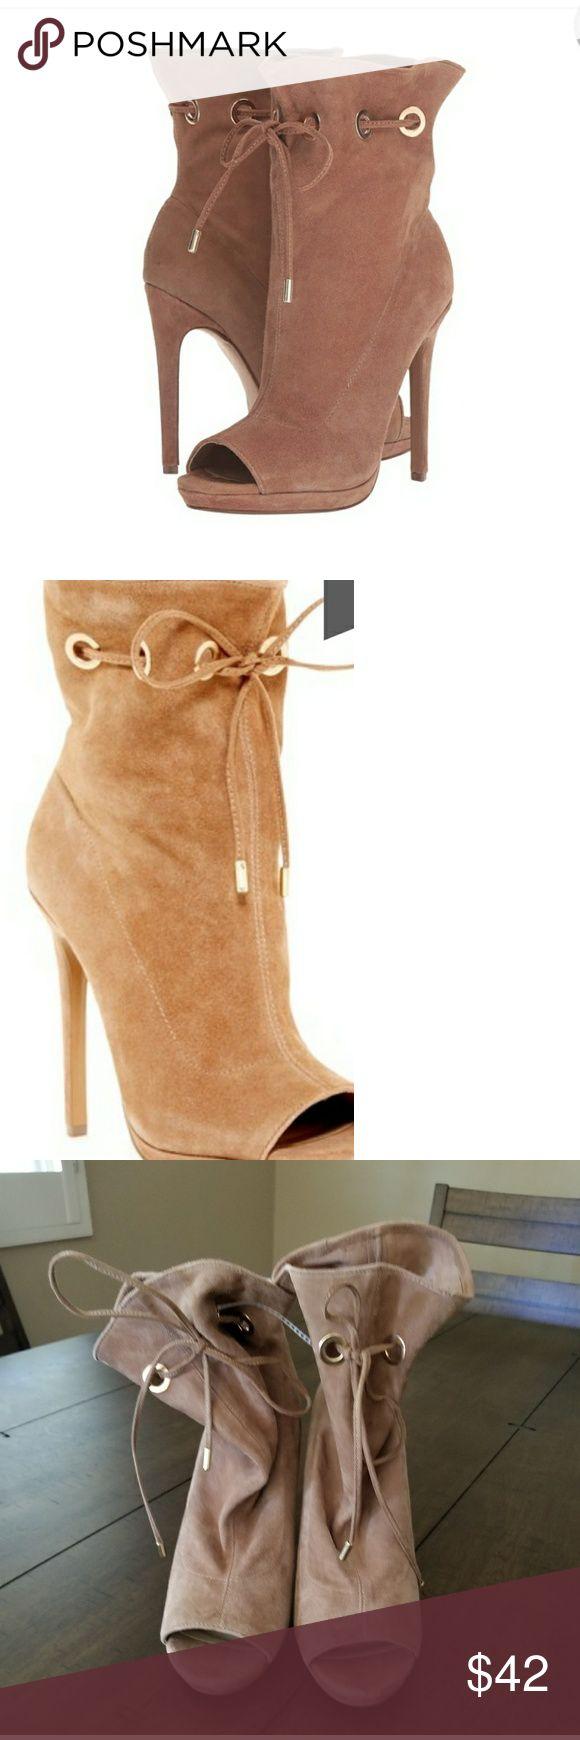 "steve madden cavalier boots steve madden cavalier boots.  Open toed, suede, 5"" heel.  Fantastic shoes Steve Madden Shoes Ankle Boots & Booties"